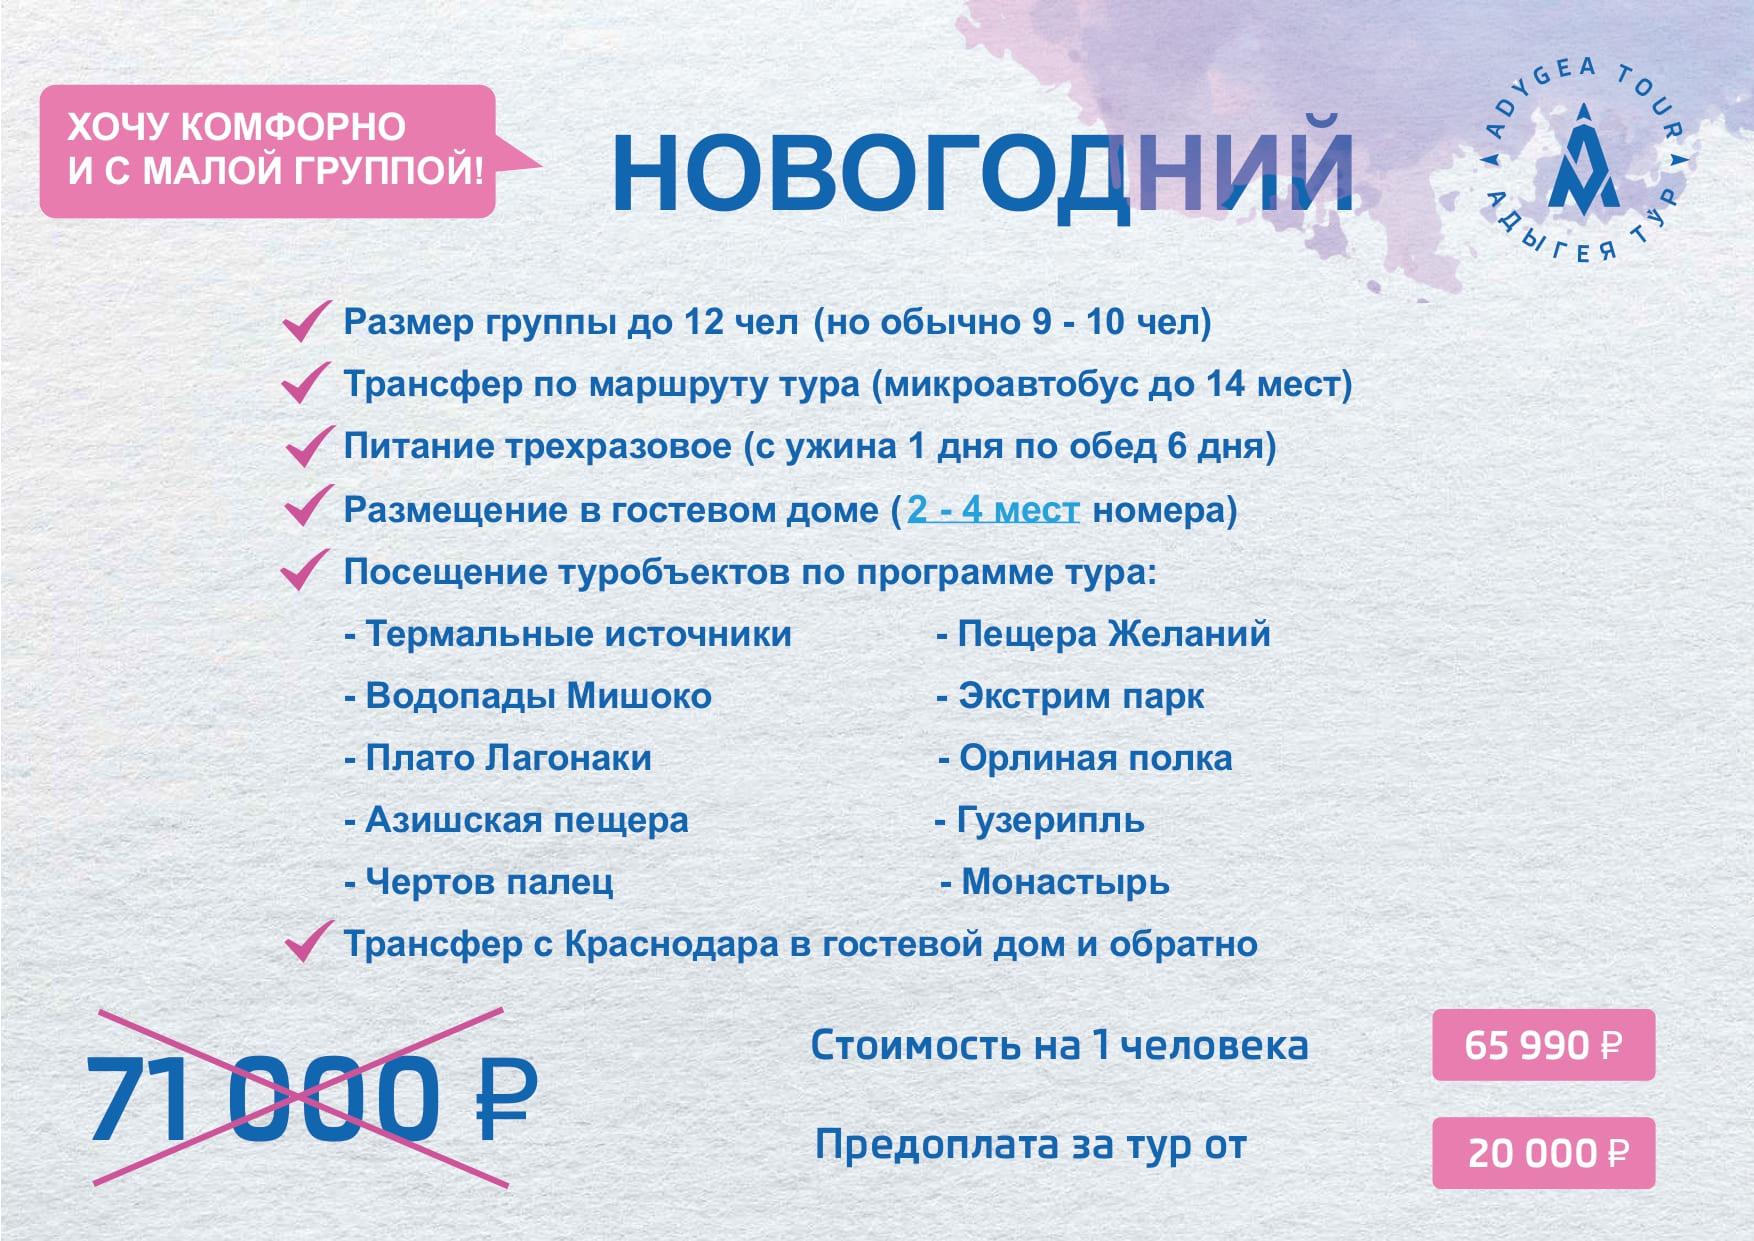 Новогодний Адыгея_compressed (1)_page-0018